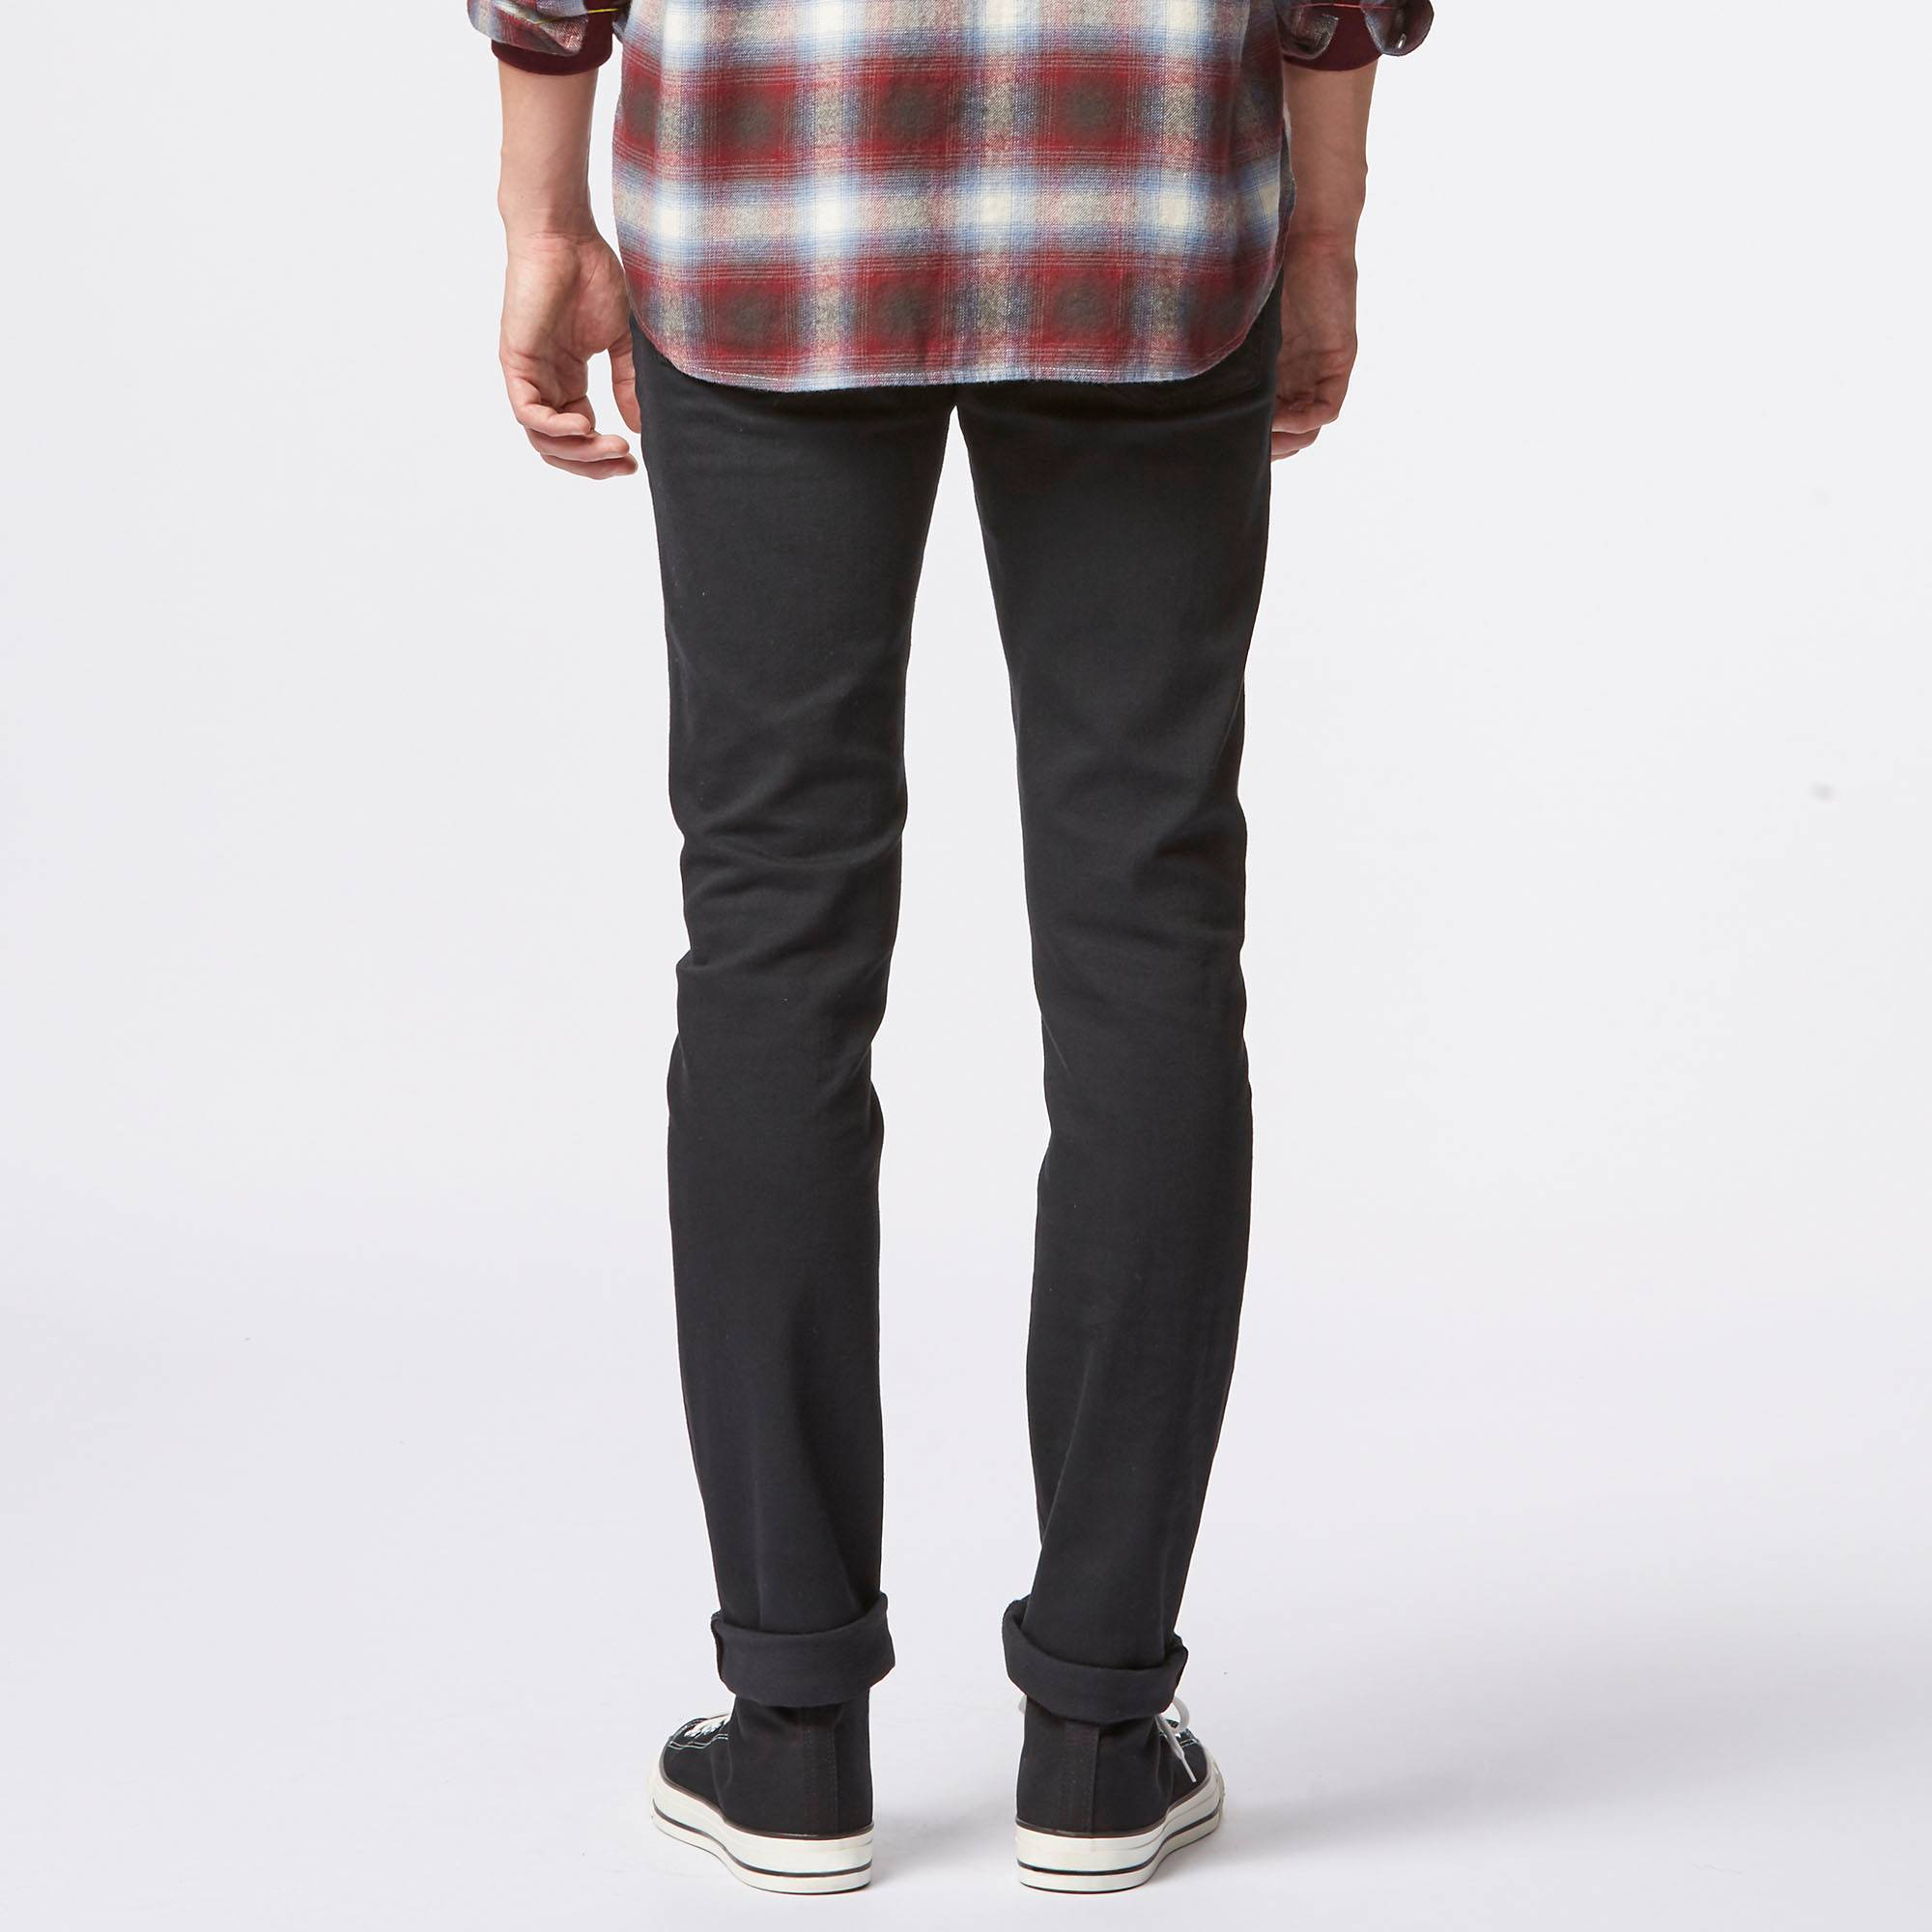 Stretch skinny jeans | UNIQLO US